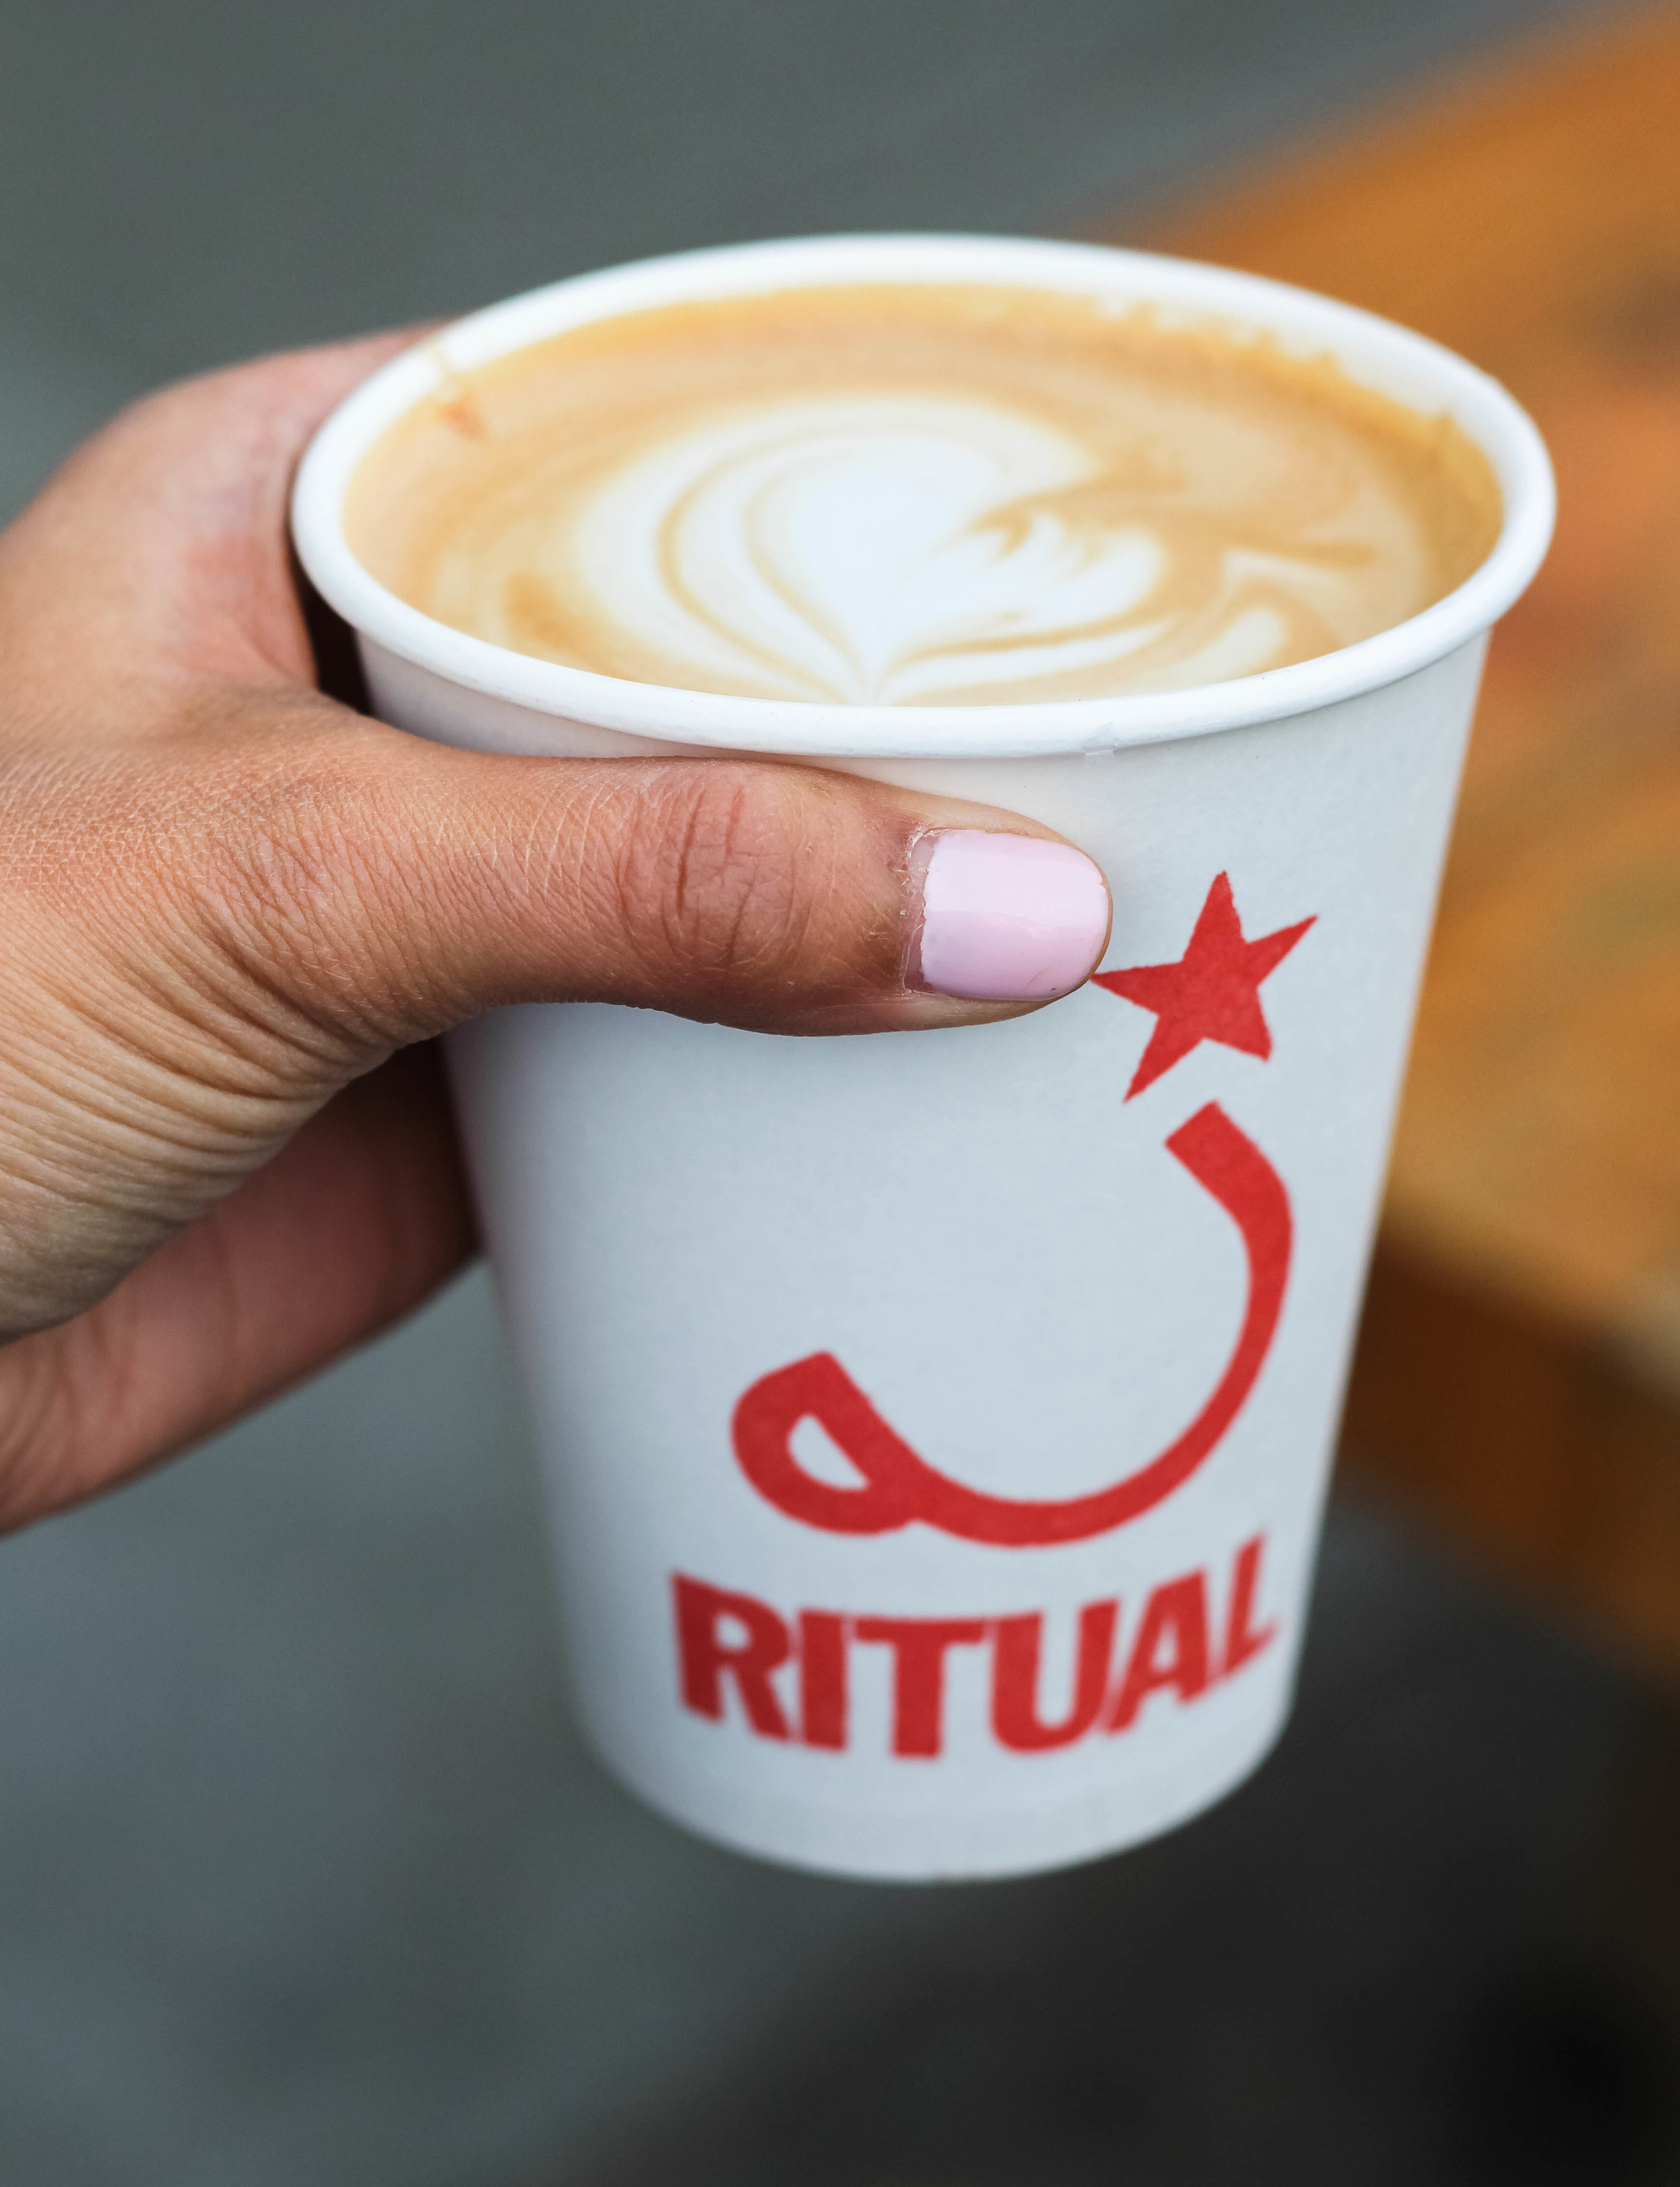 Best Coffee Shops in San Francisco: Ritual Coffee